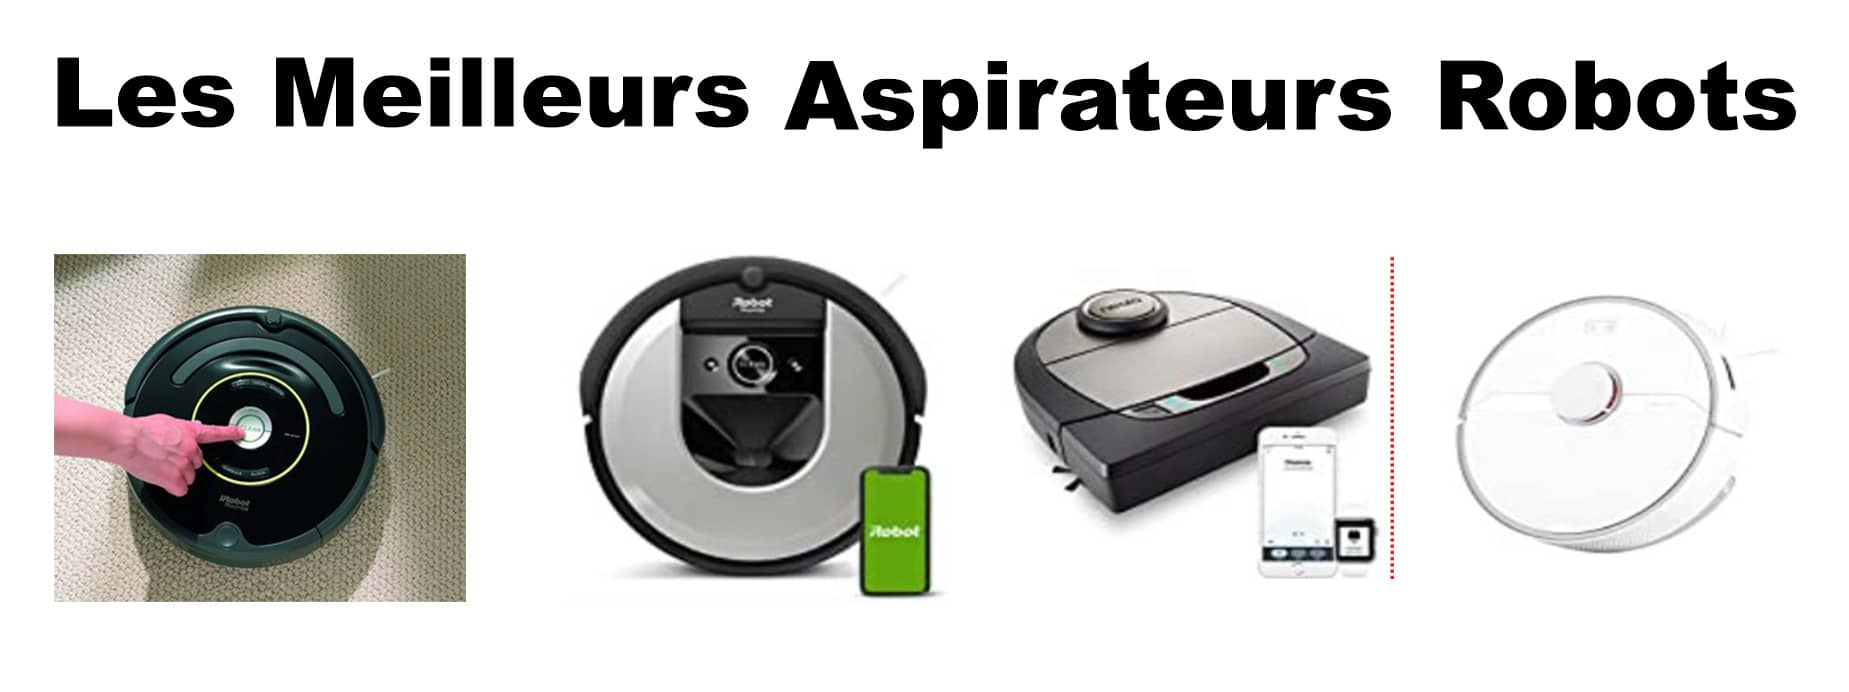 Meilleur aspirateur robot avis, promo comparatif